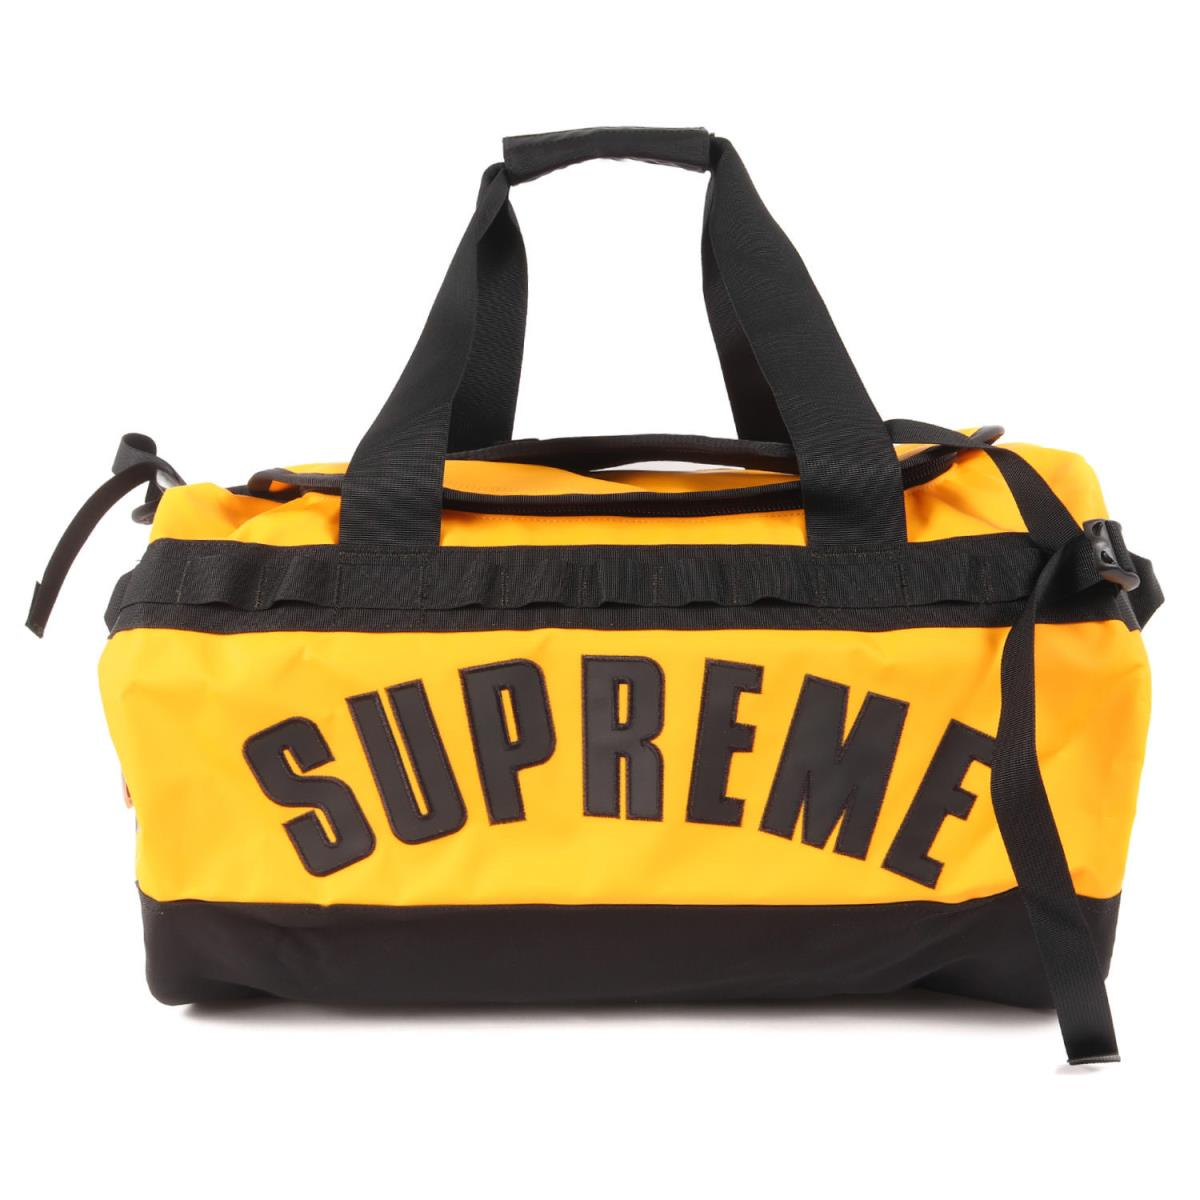 Supreme シュプリーム バッグ THE NORTH FACE ダッフルバッグ Arc Logo Base Camp Duffle Bag 19SS イエロー 【メンズ】【K2619】